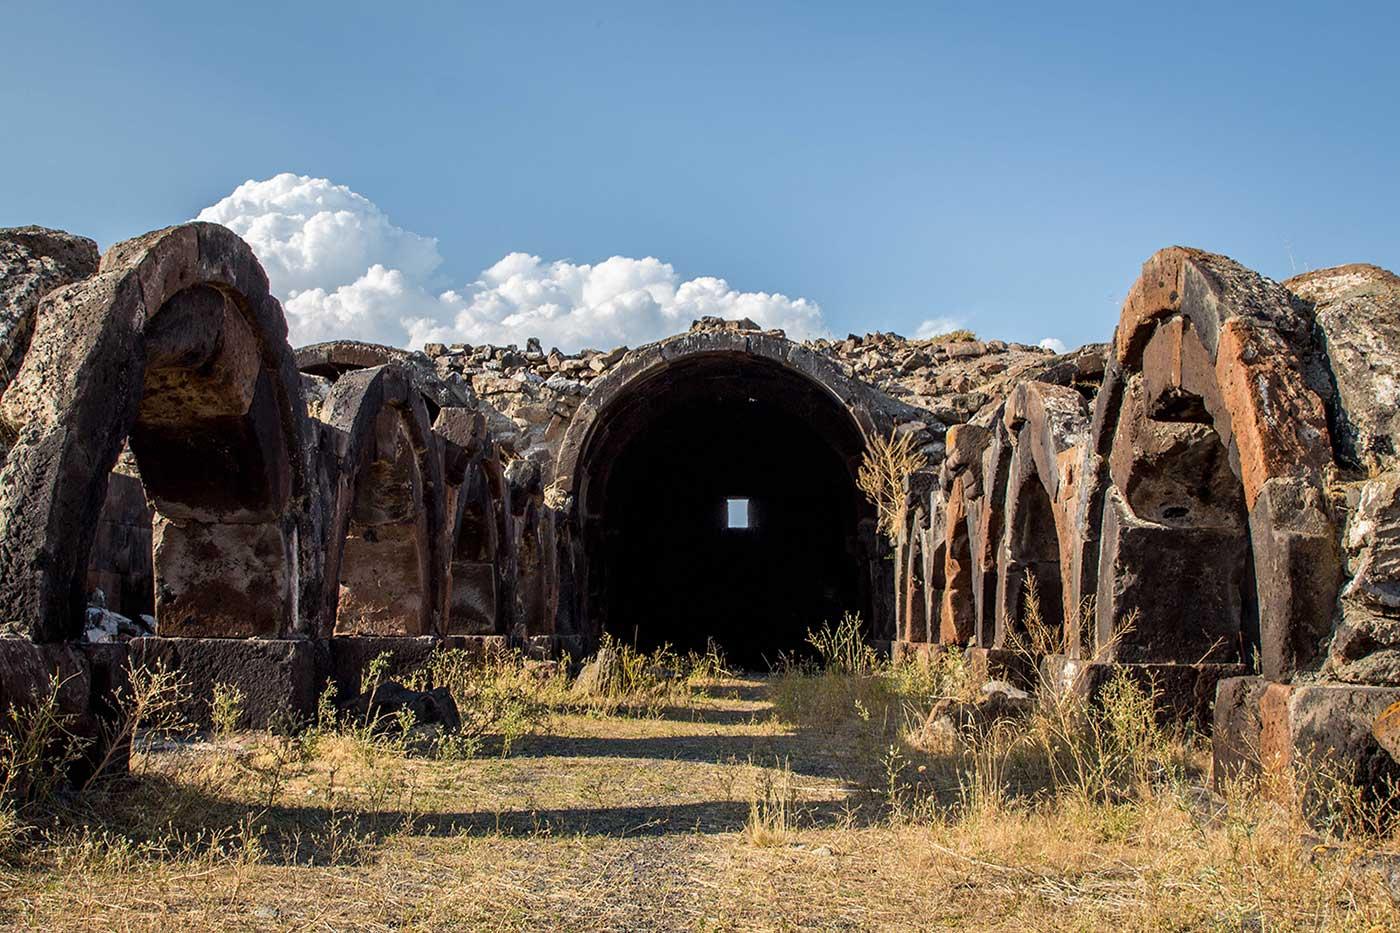 The ruins of the former Caravansaray at Jrapi, Armenia.